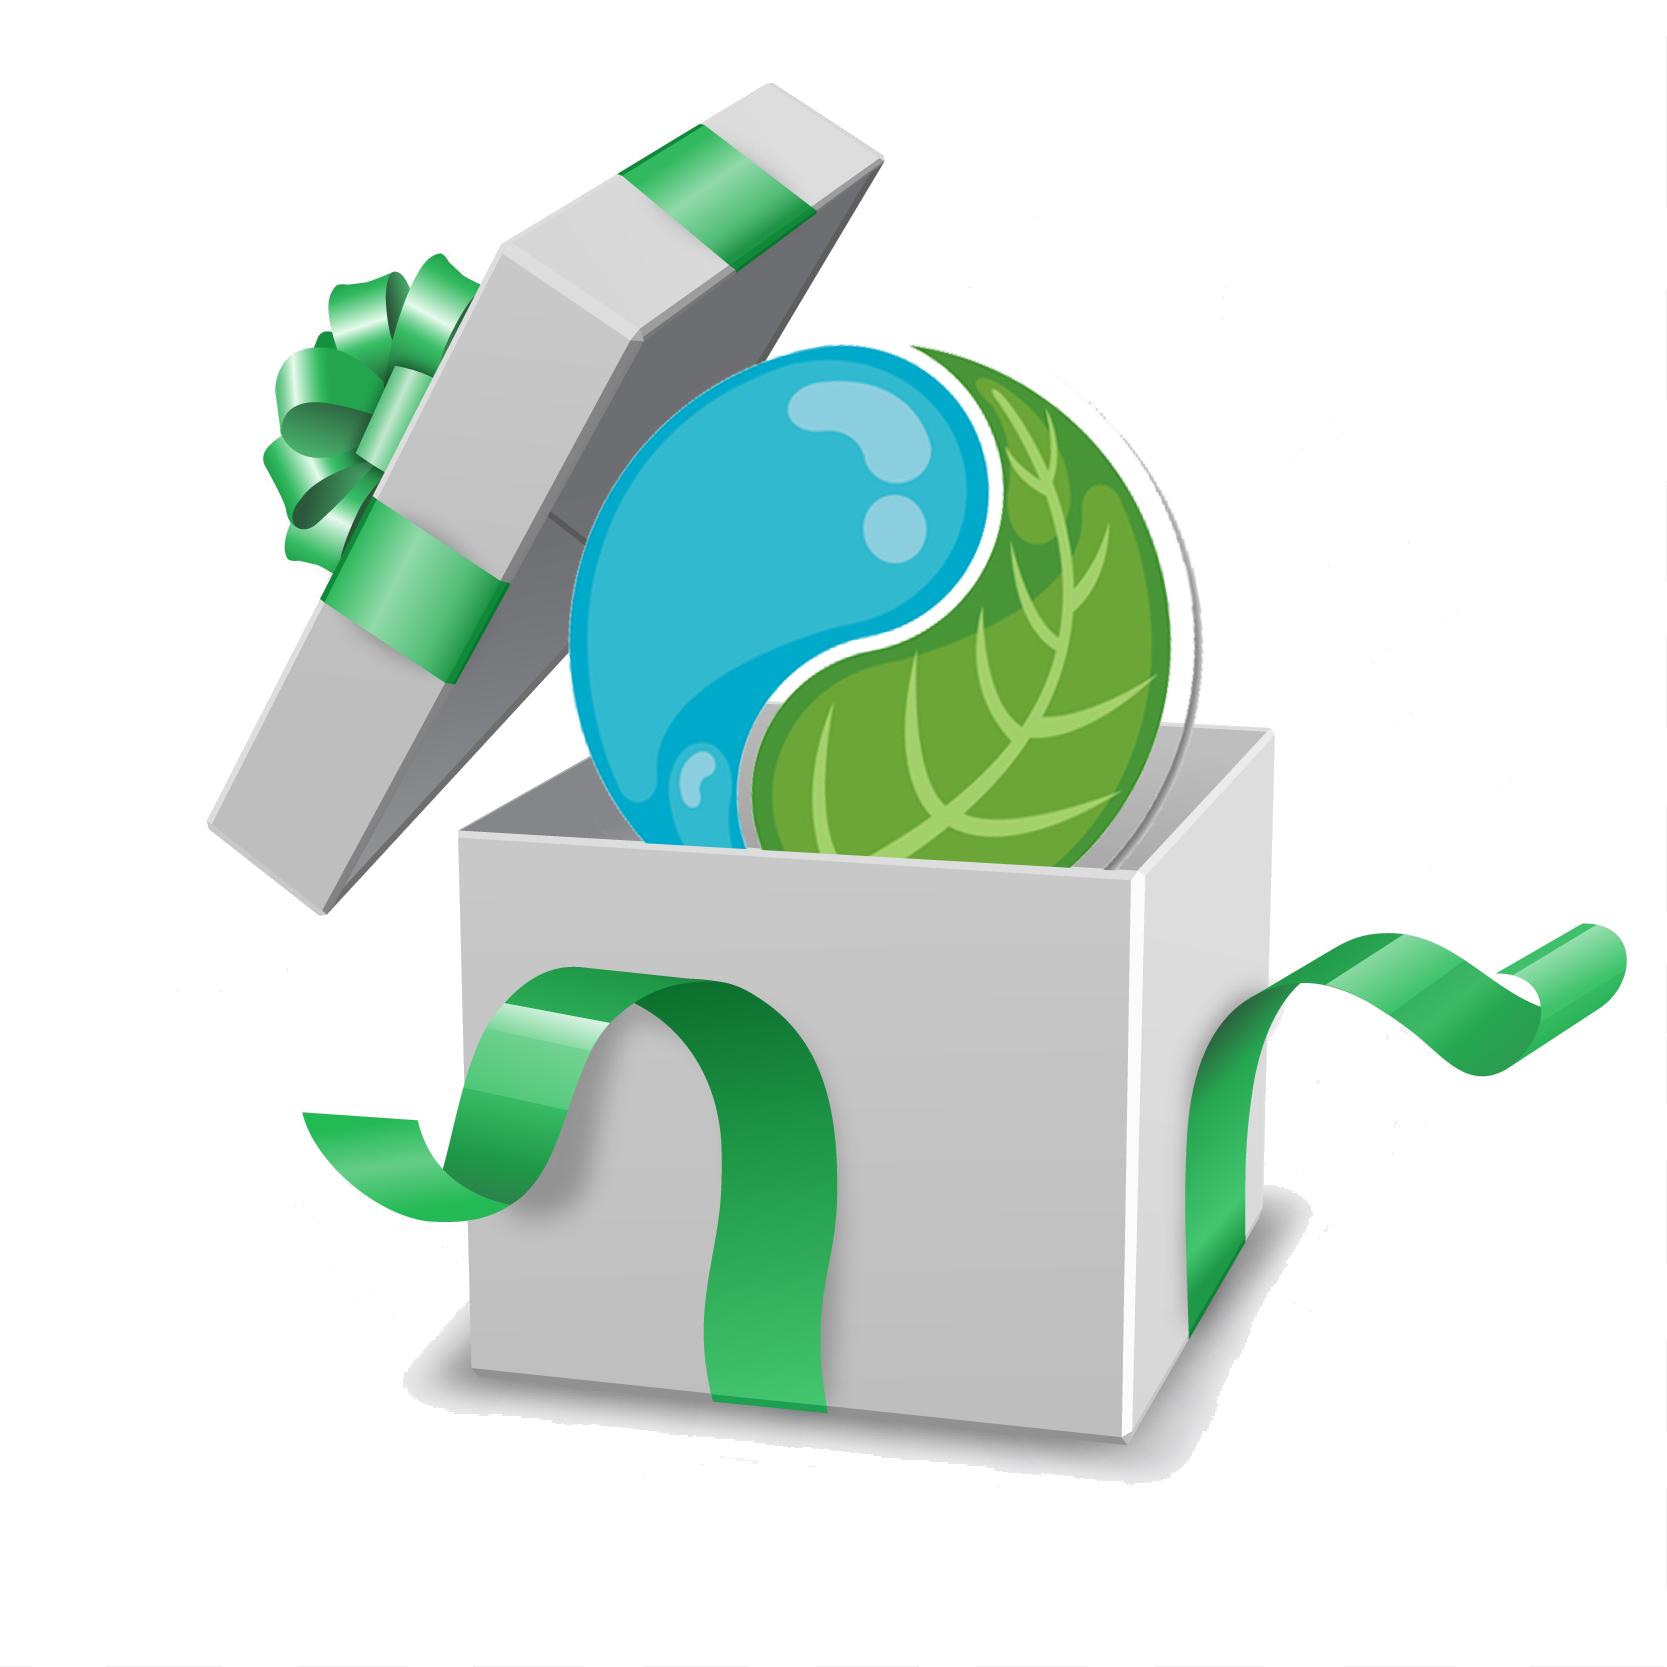 Idee regalo ecologiche per mamme e bambini ecobaby for Ideeregalo it